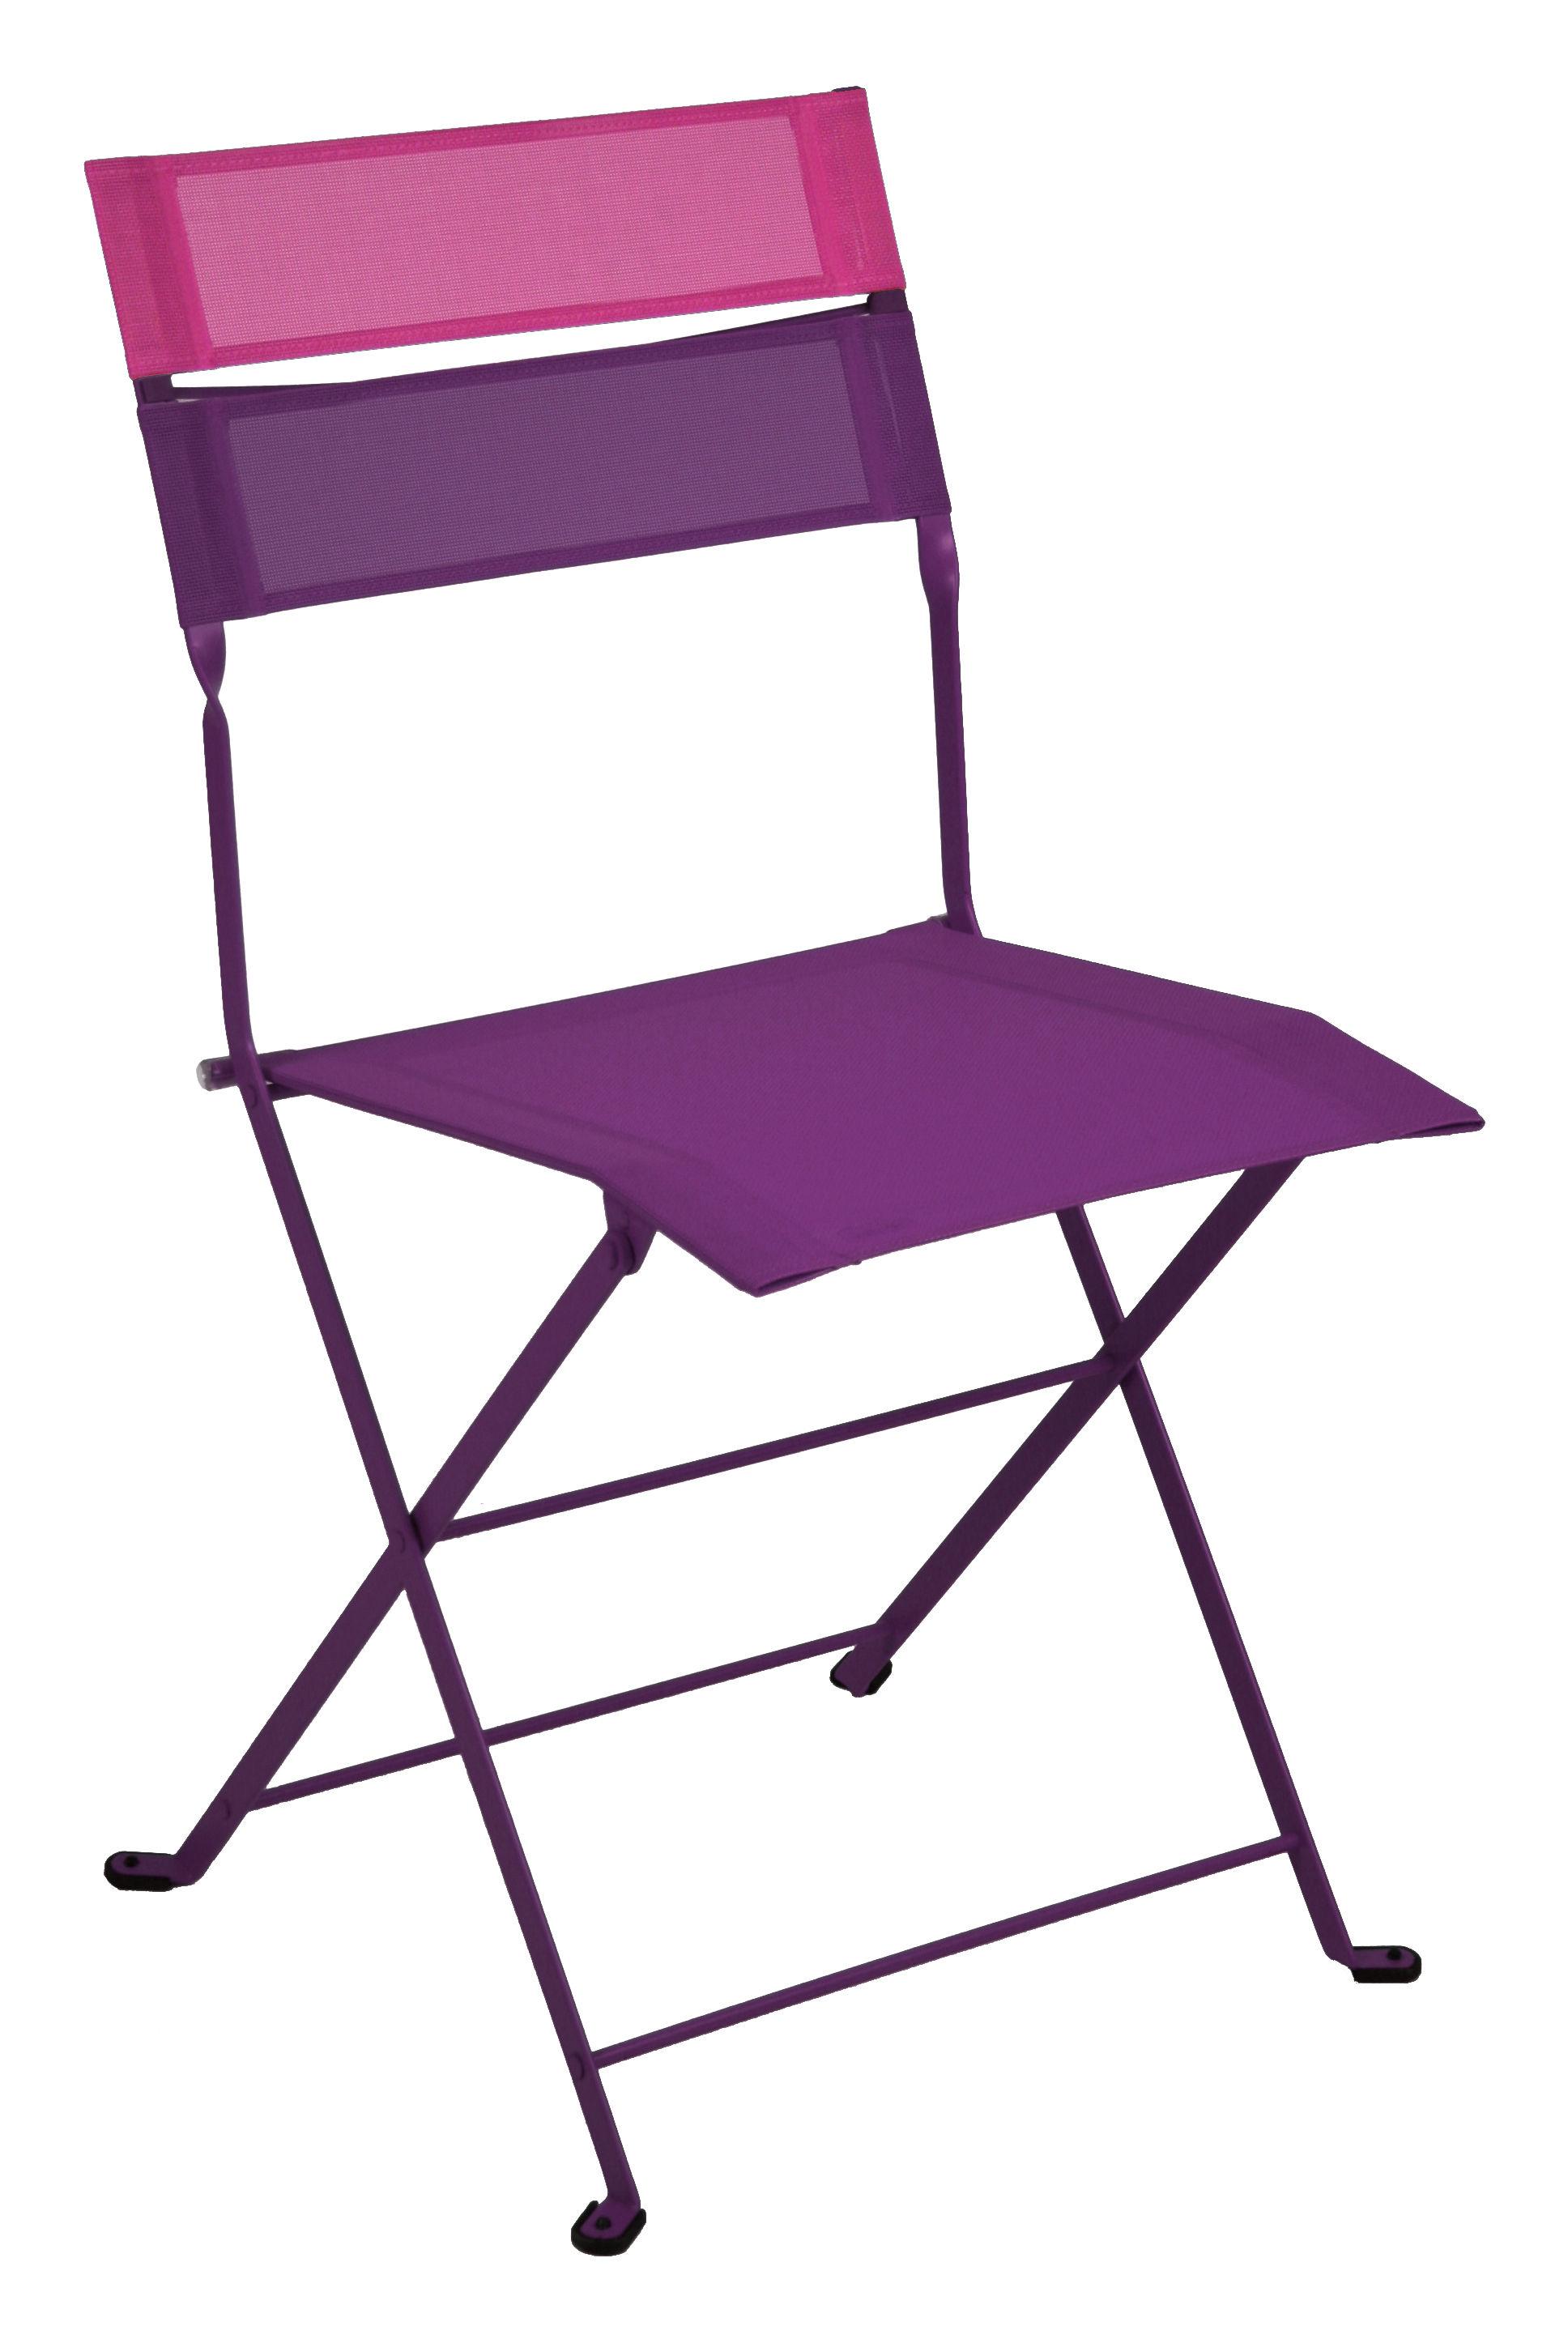 chaise pliante latitude toile aubergine bandeau fuchsia fermob. Black Bedroom Furniture Sets. Home Design Ideas